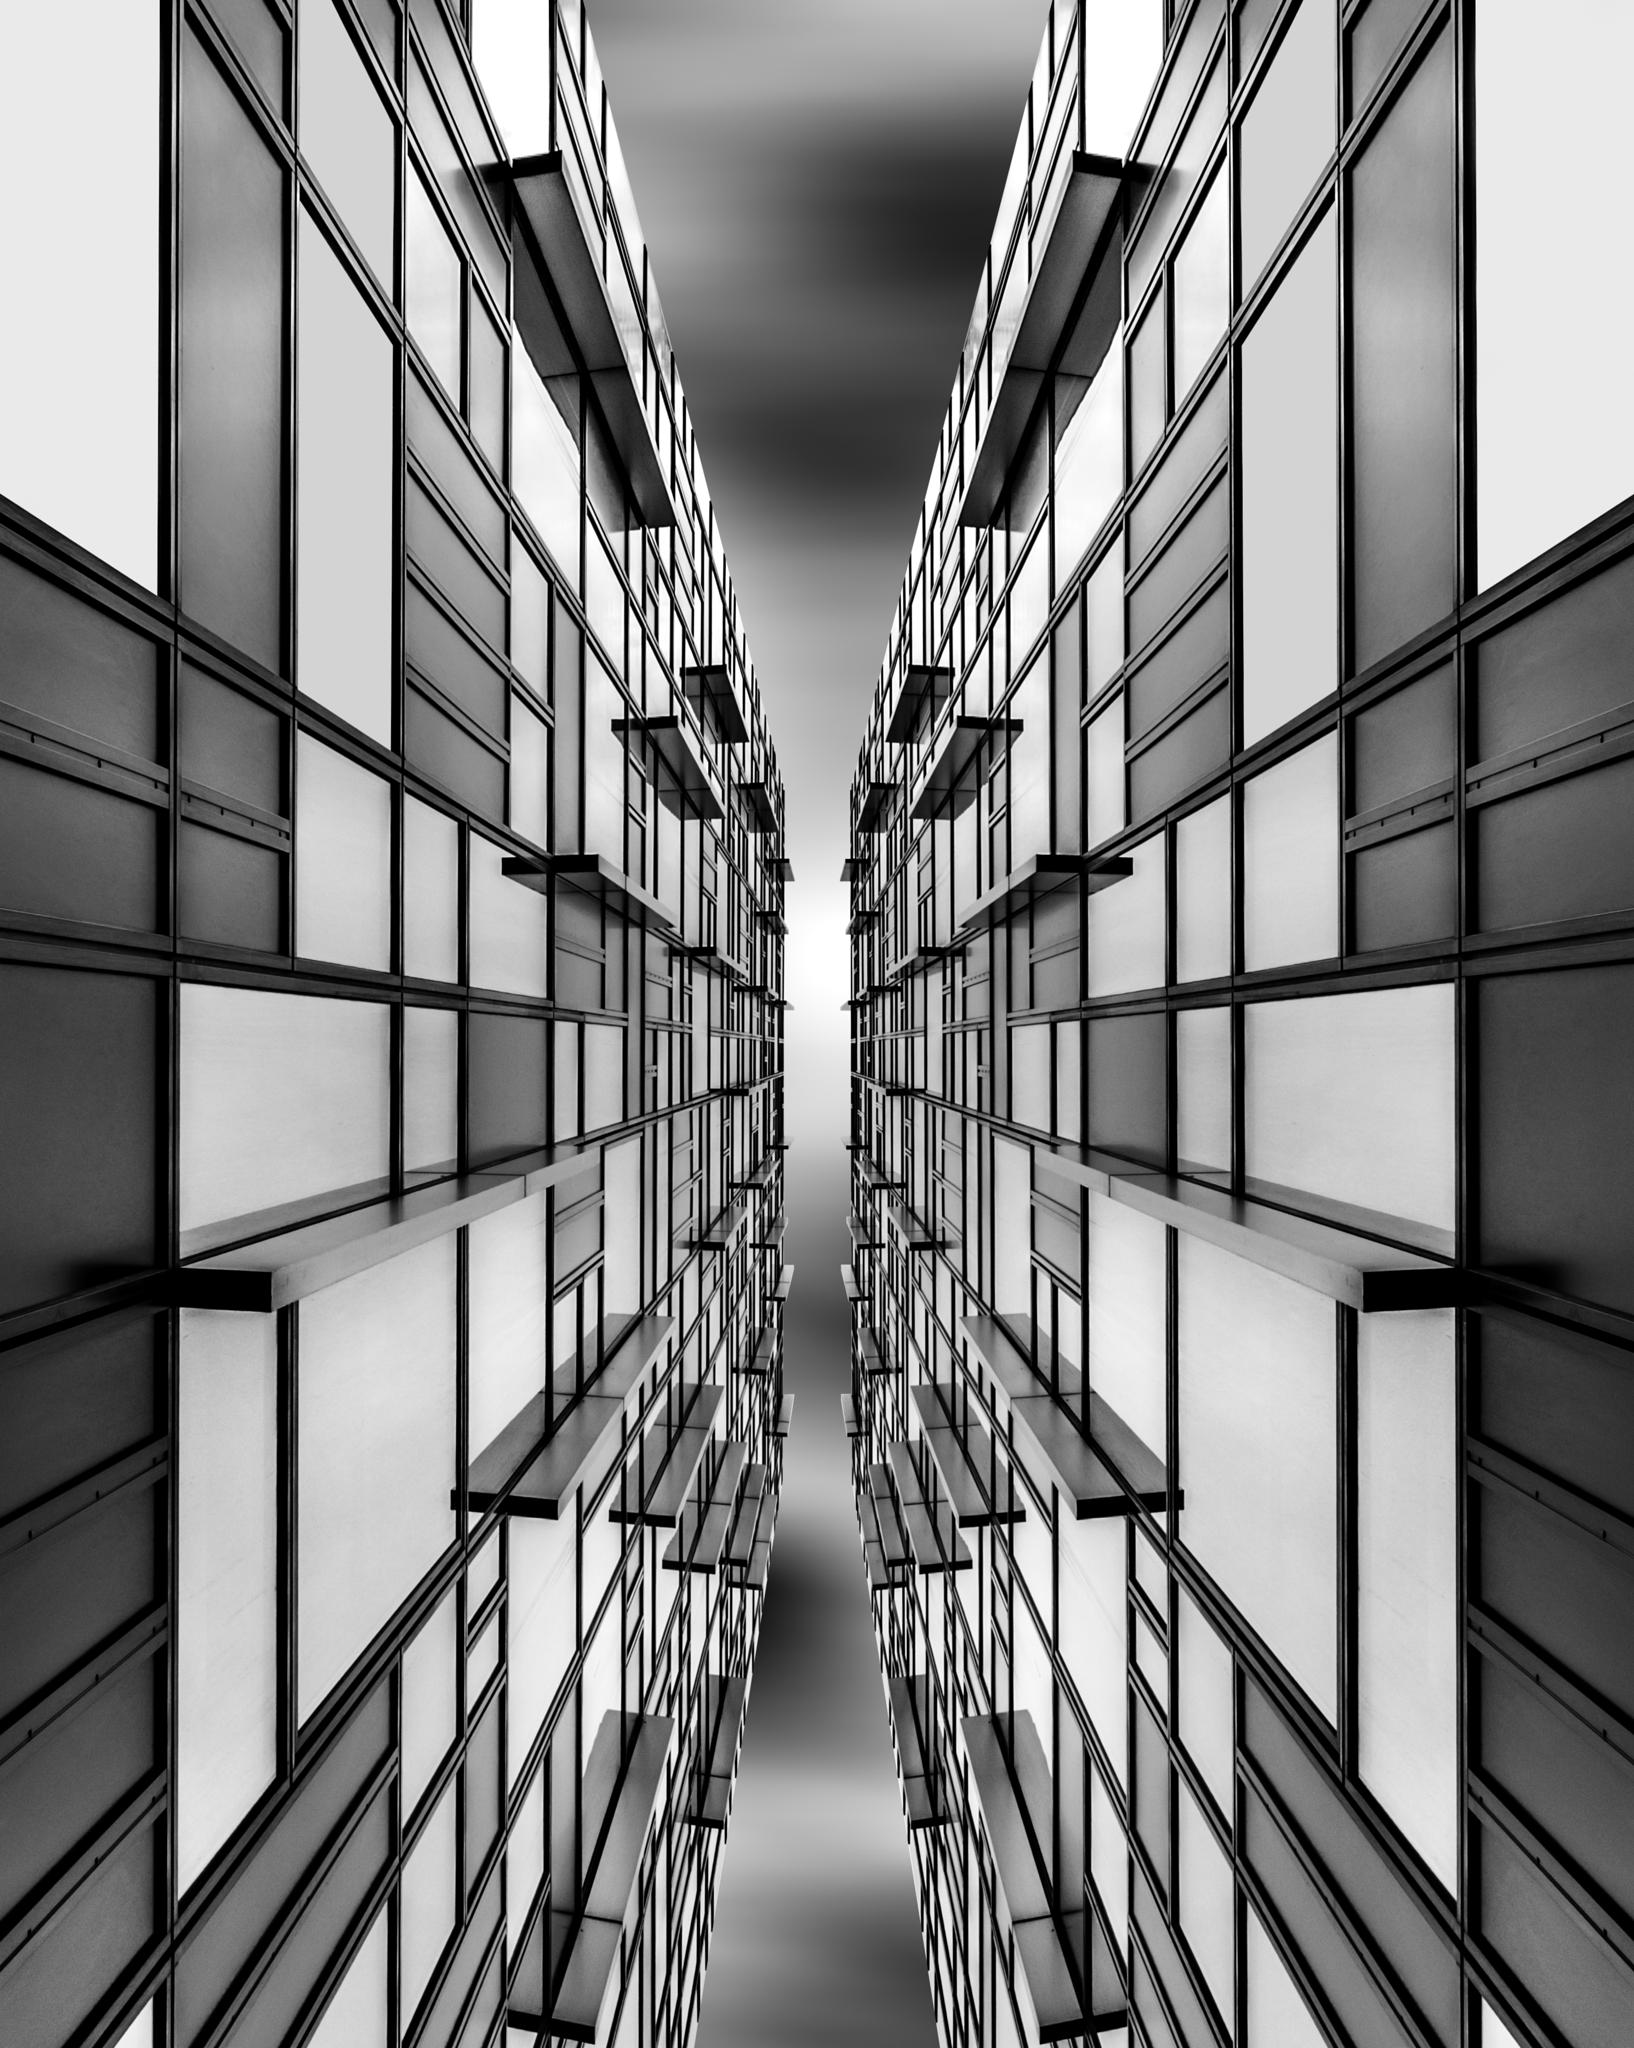 Mirror Image by Karl Shepheard